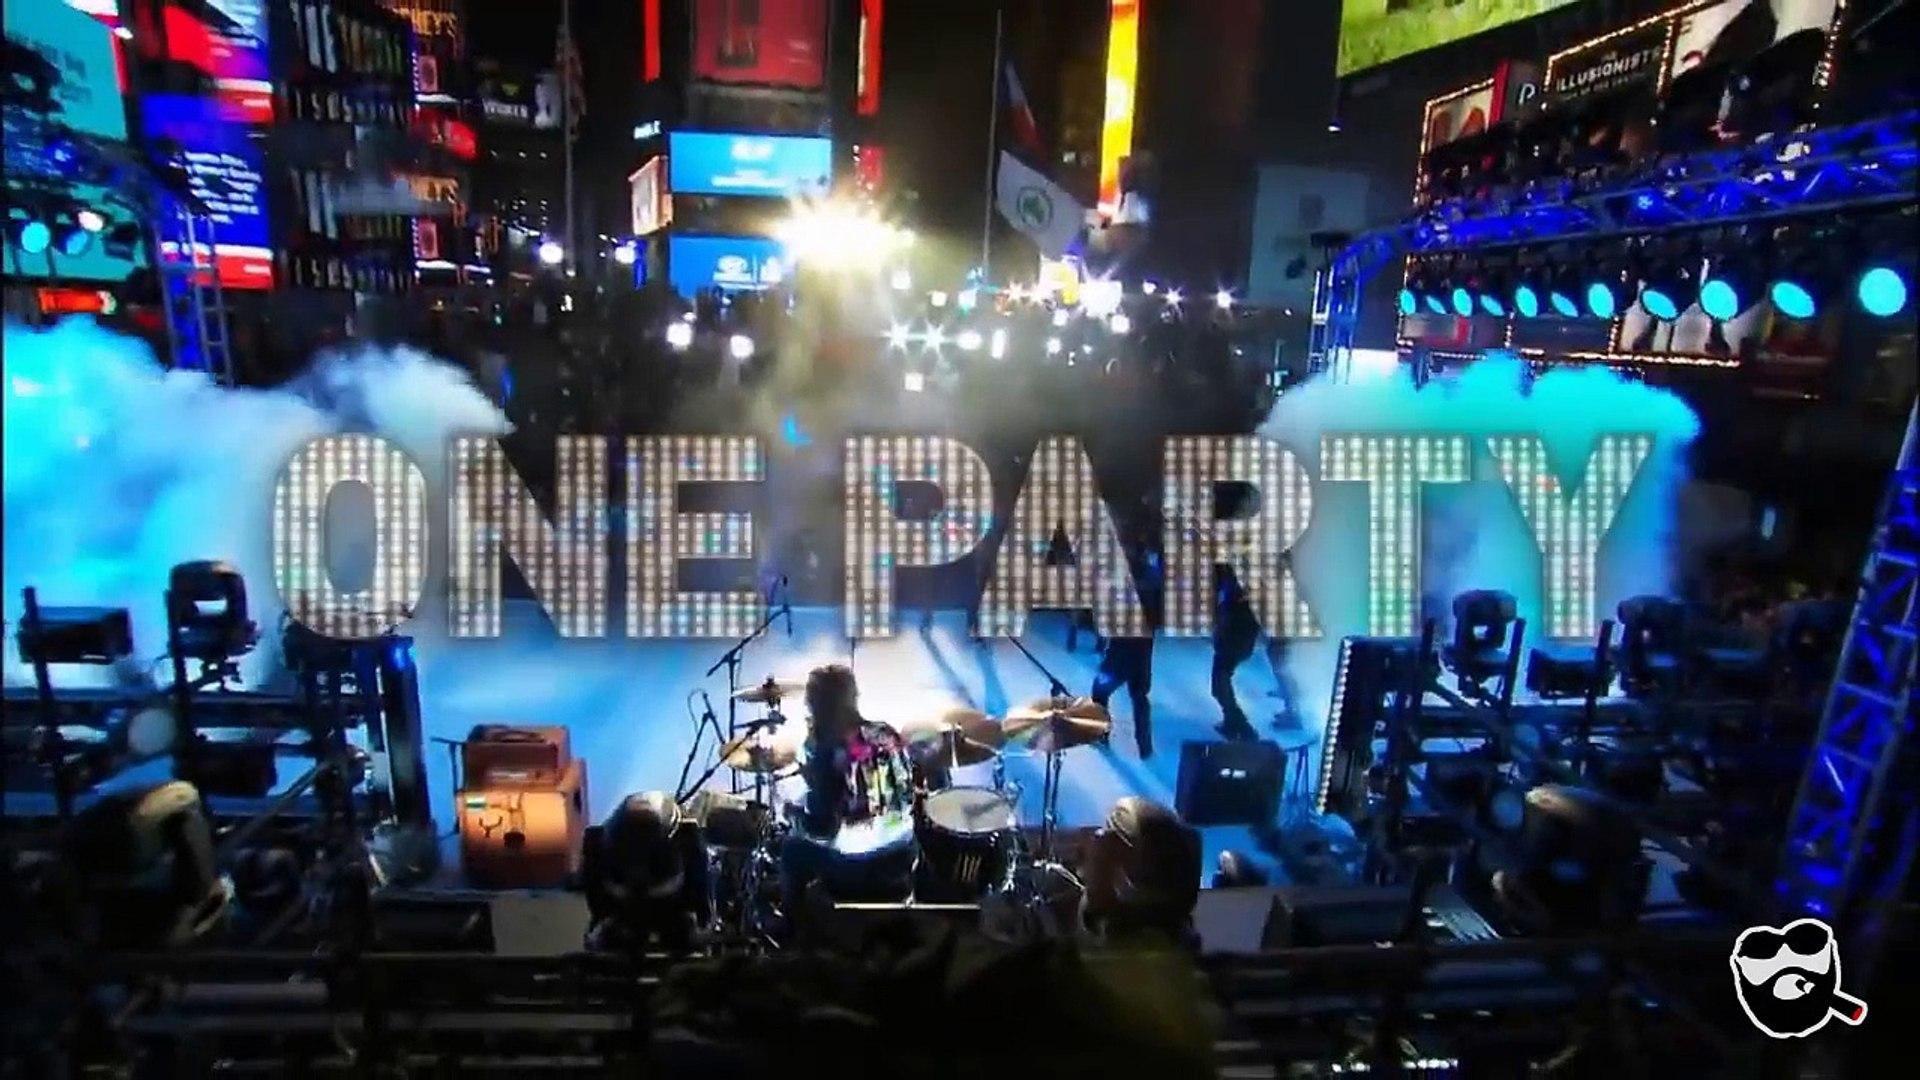 Dick Clark's New Year's Rockin' Eve with Ryan Seacrest 2018 Full Stream